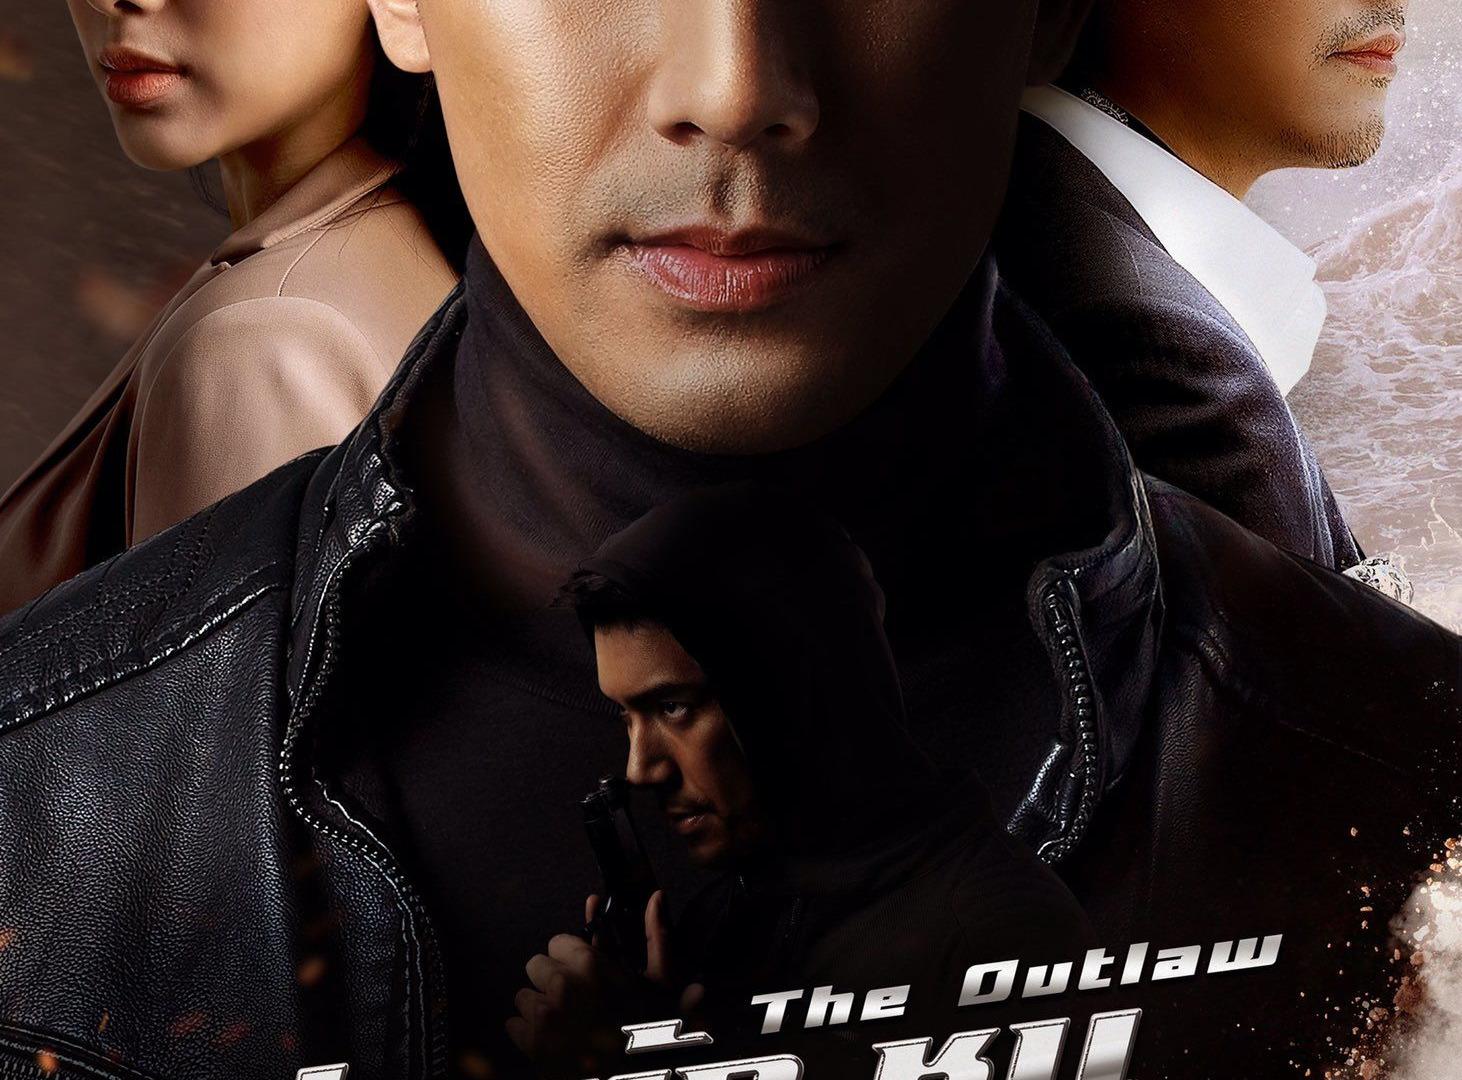 Сериал The Outlaw